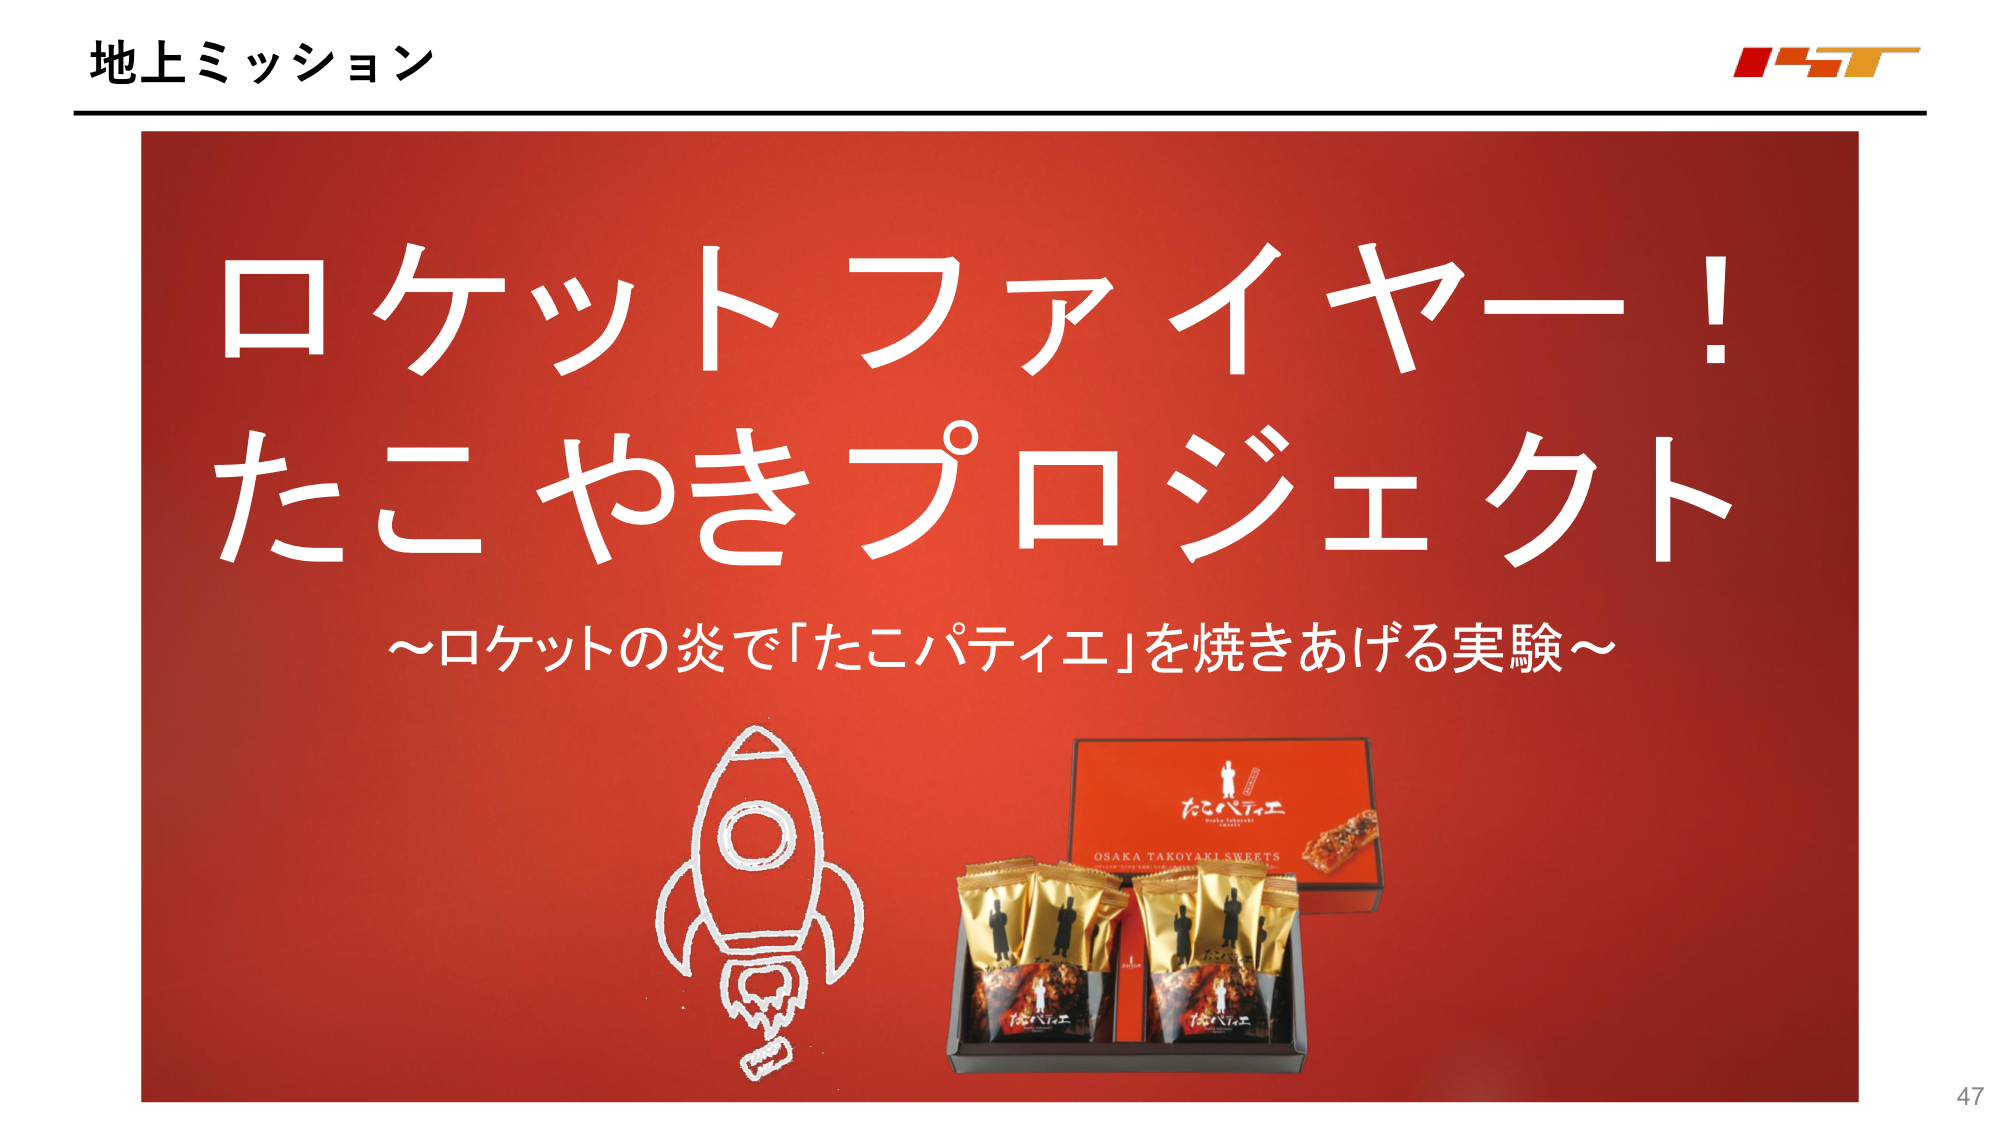 f:id:Imamura:20200603233216p:plain